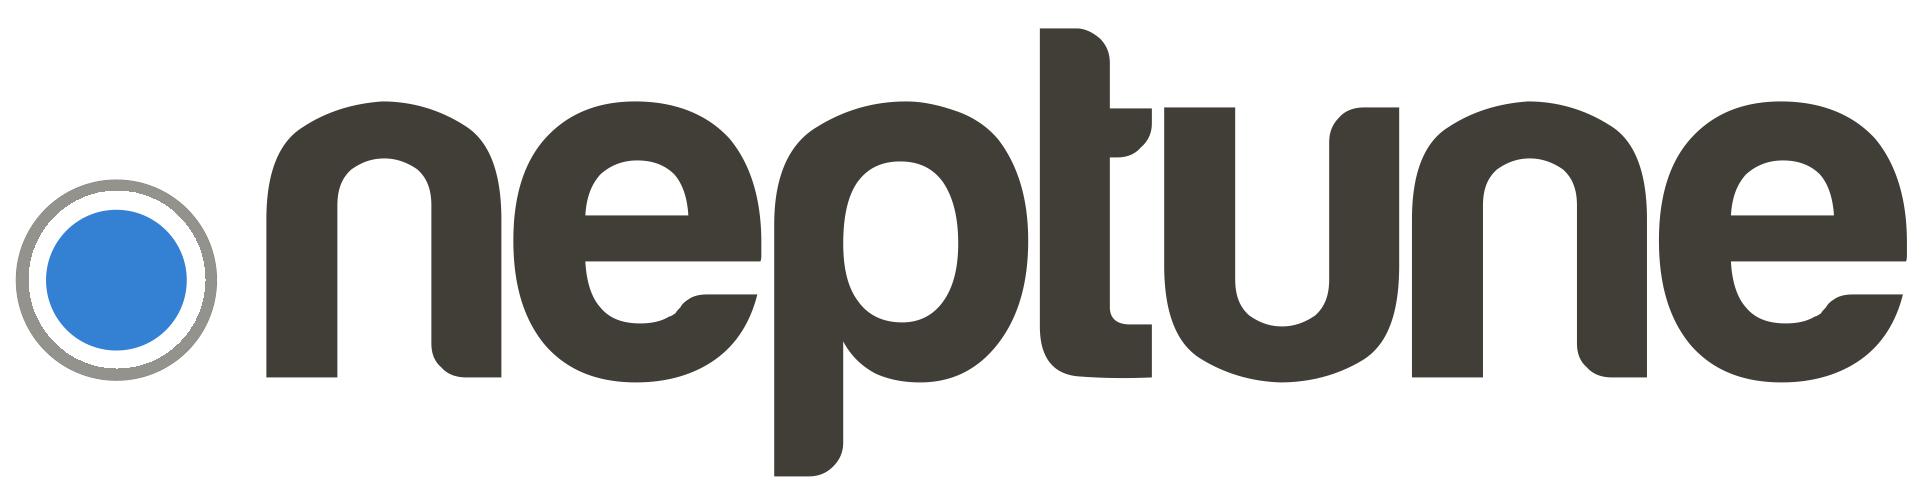 Exclusive Customizable Logo For Sale: Neptune | StockLogos.com